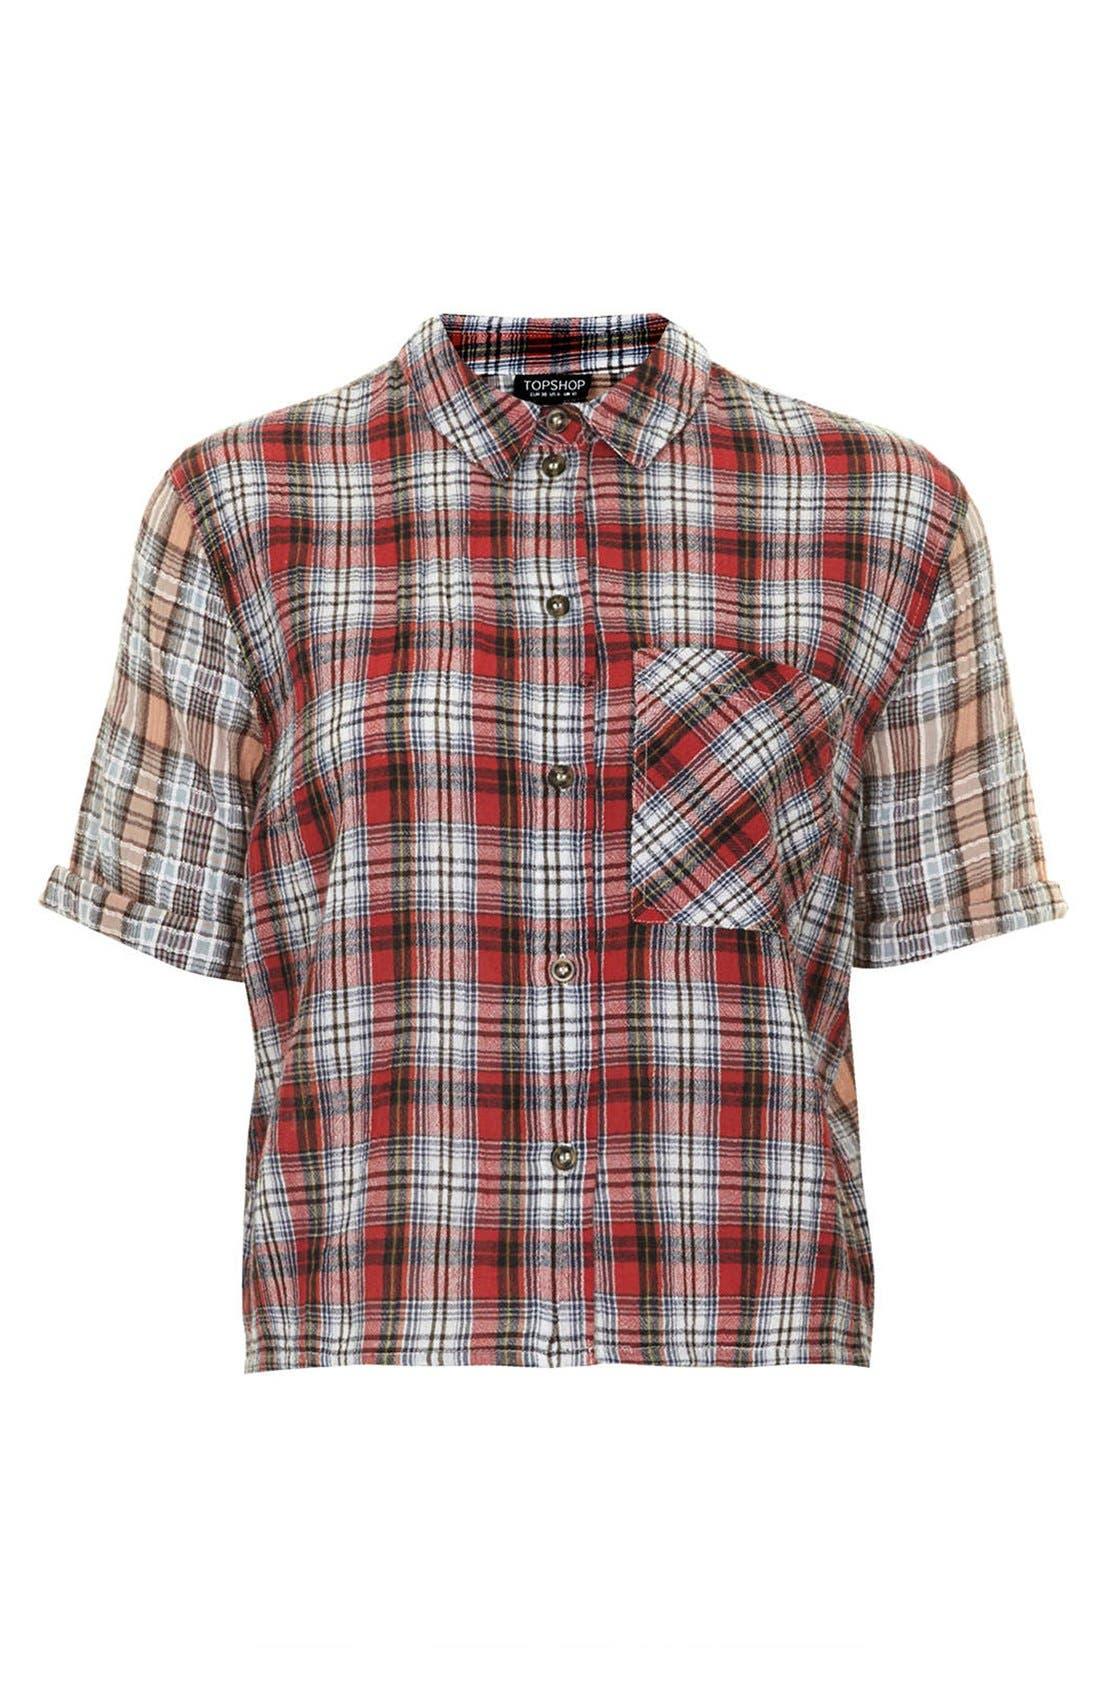 Alternate Image 3  - Topshop Check Seersucker Shirt